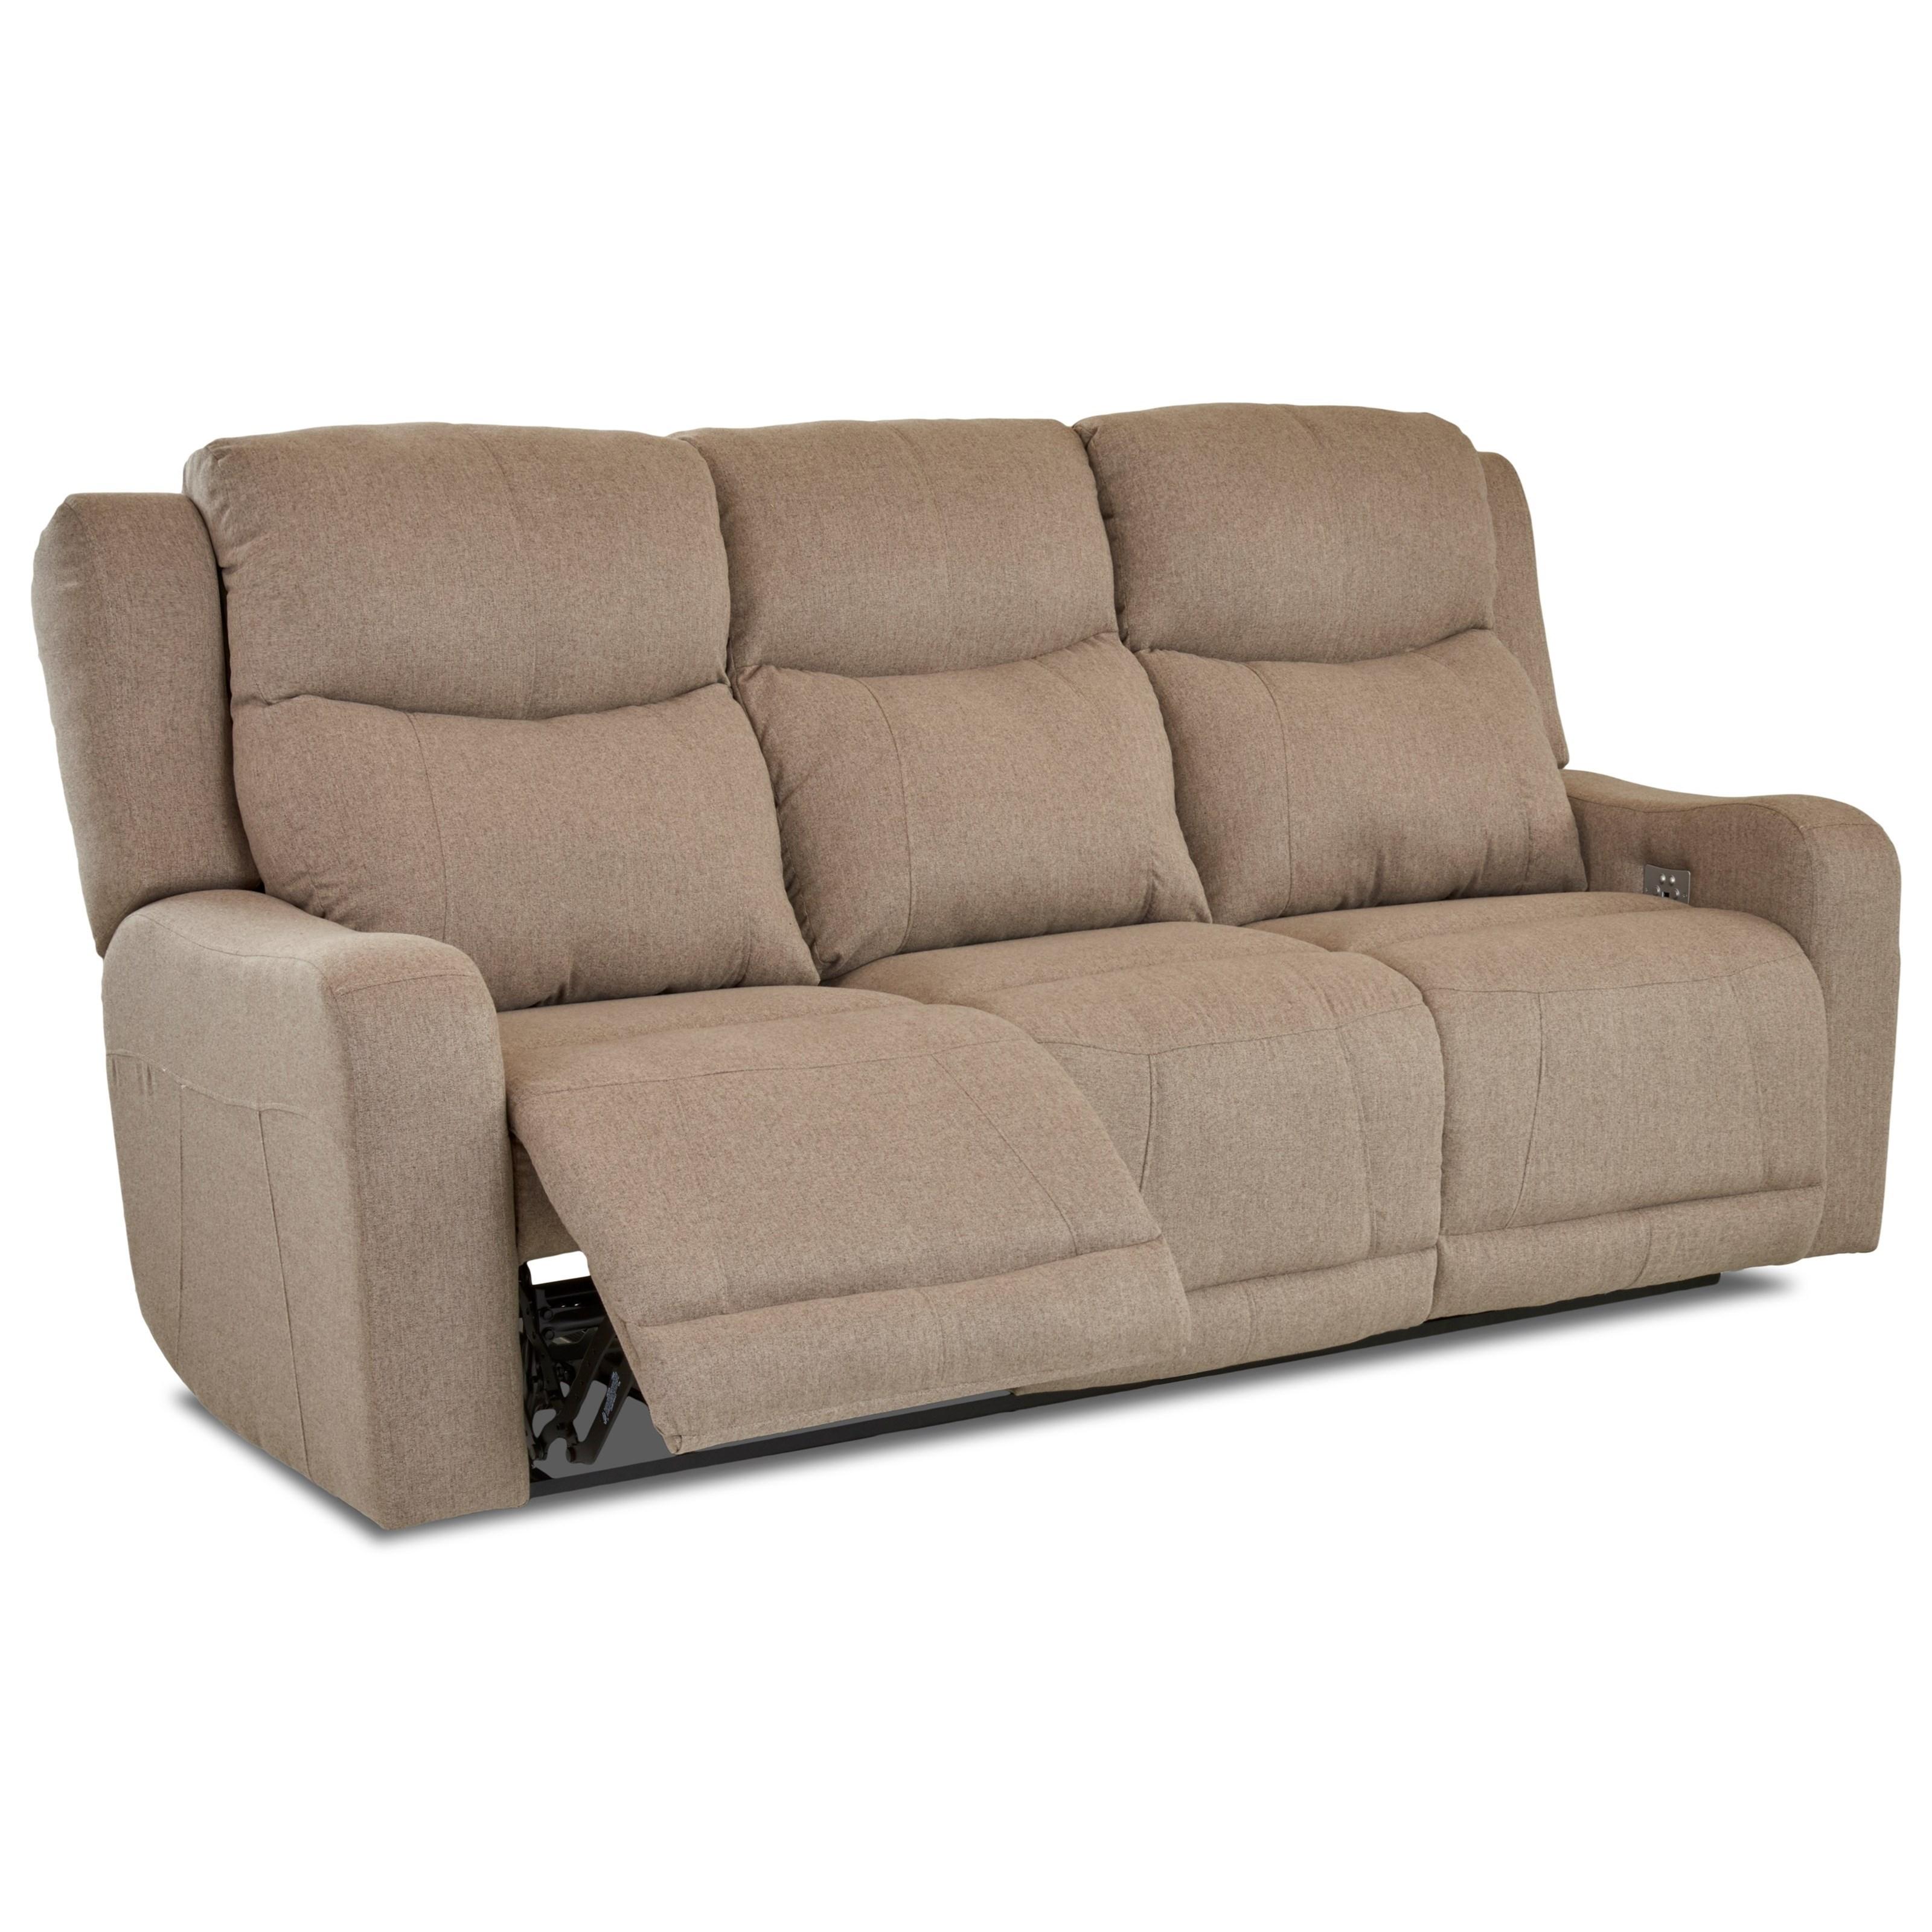 Klaussner Barnett Power Reclining Sofa With Power Headrest